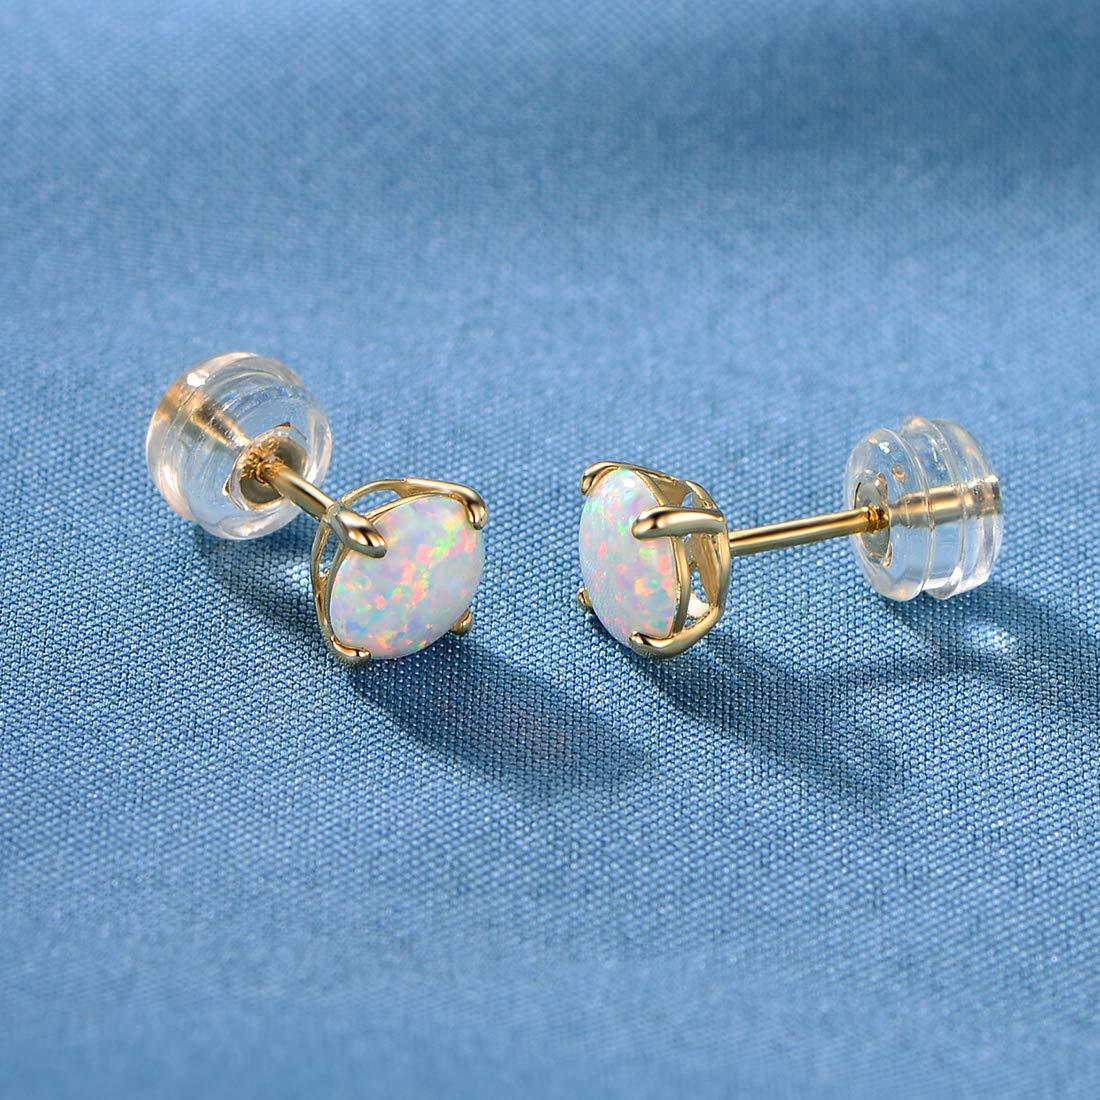 GEMSME 10K Solid White Gold 6.00mm Round Opal Stud Earrings